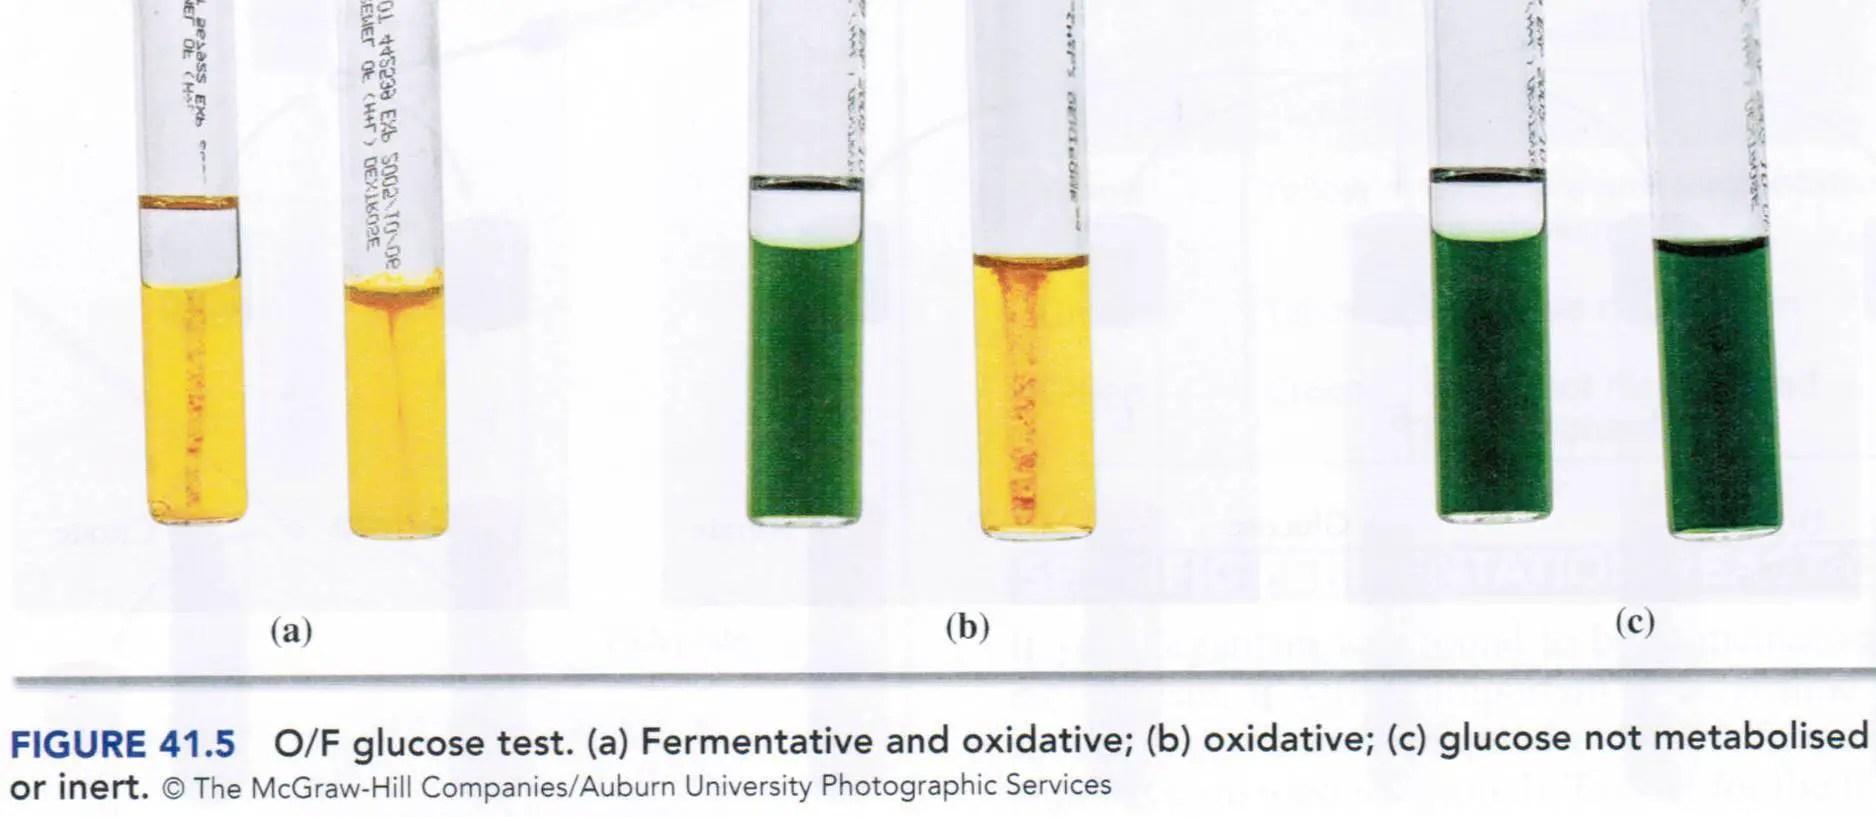 Oxidative fermentative (OF) test: Principle, procedure and